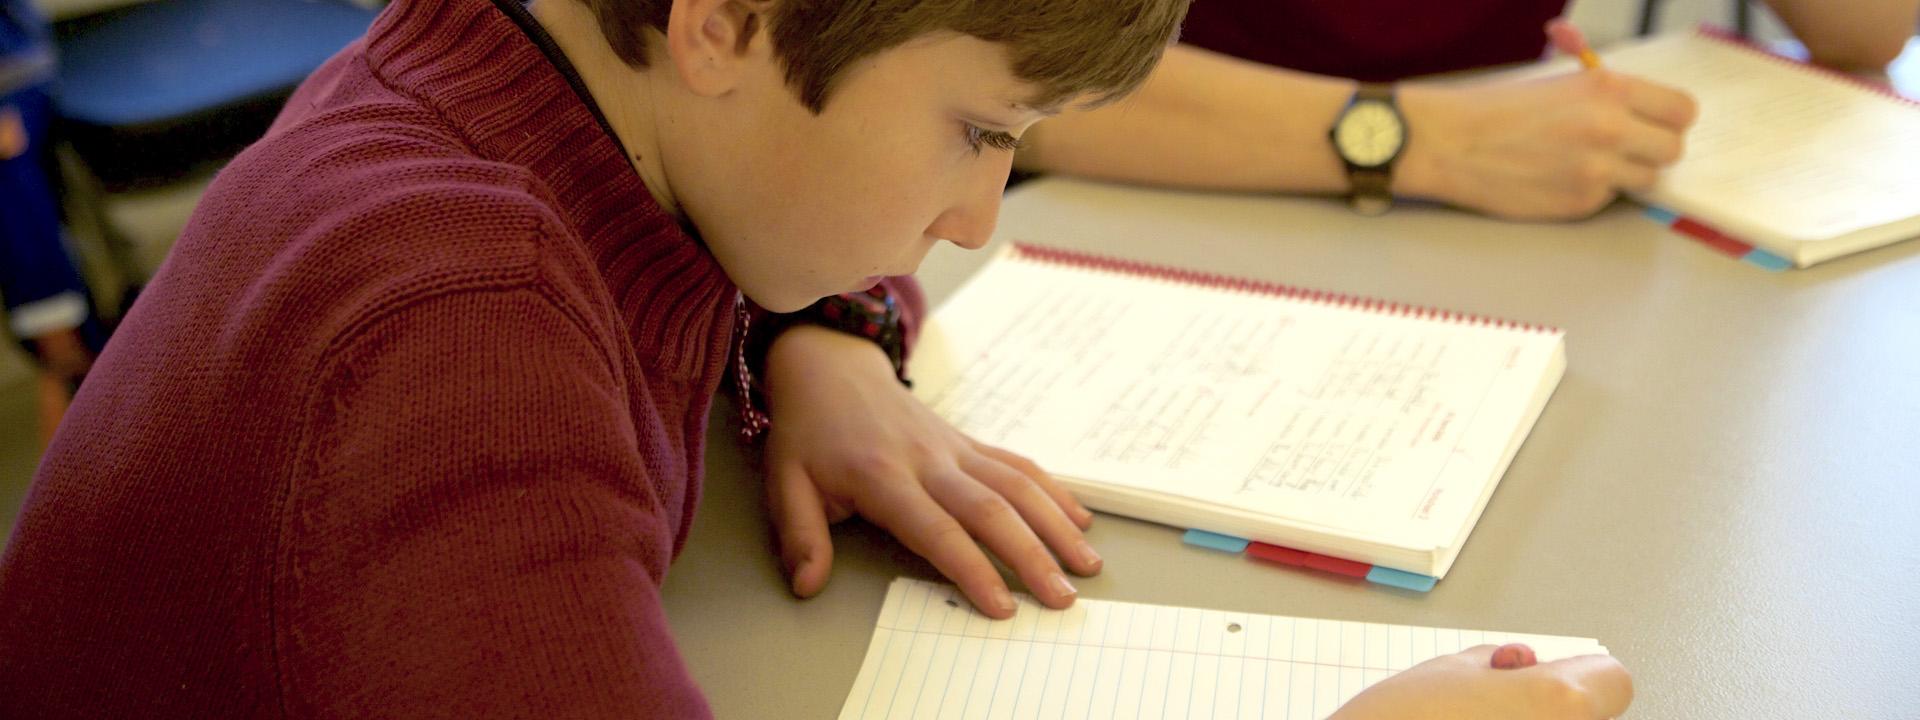 boy-study-2